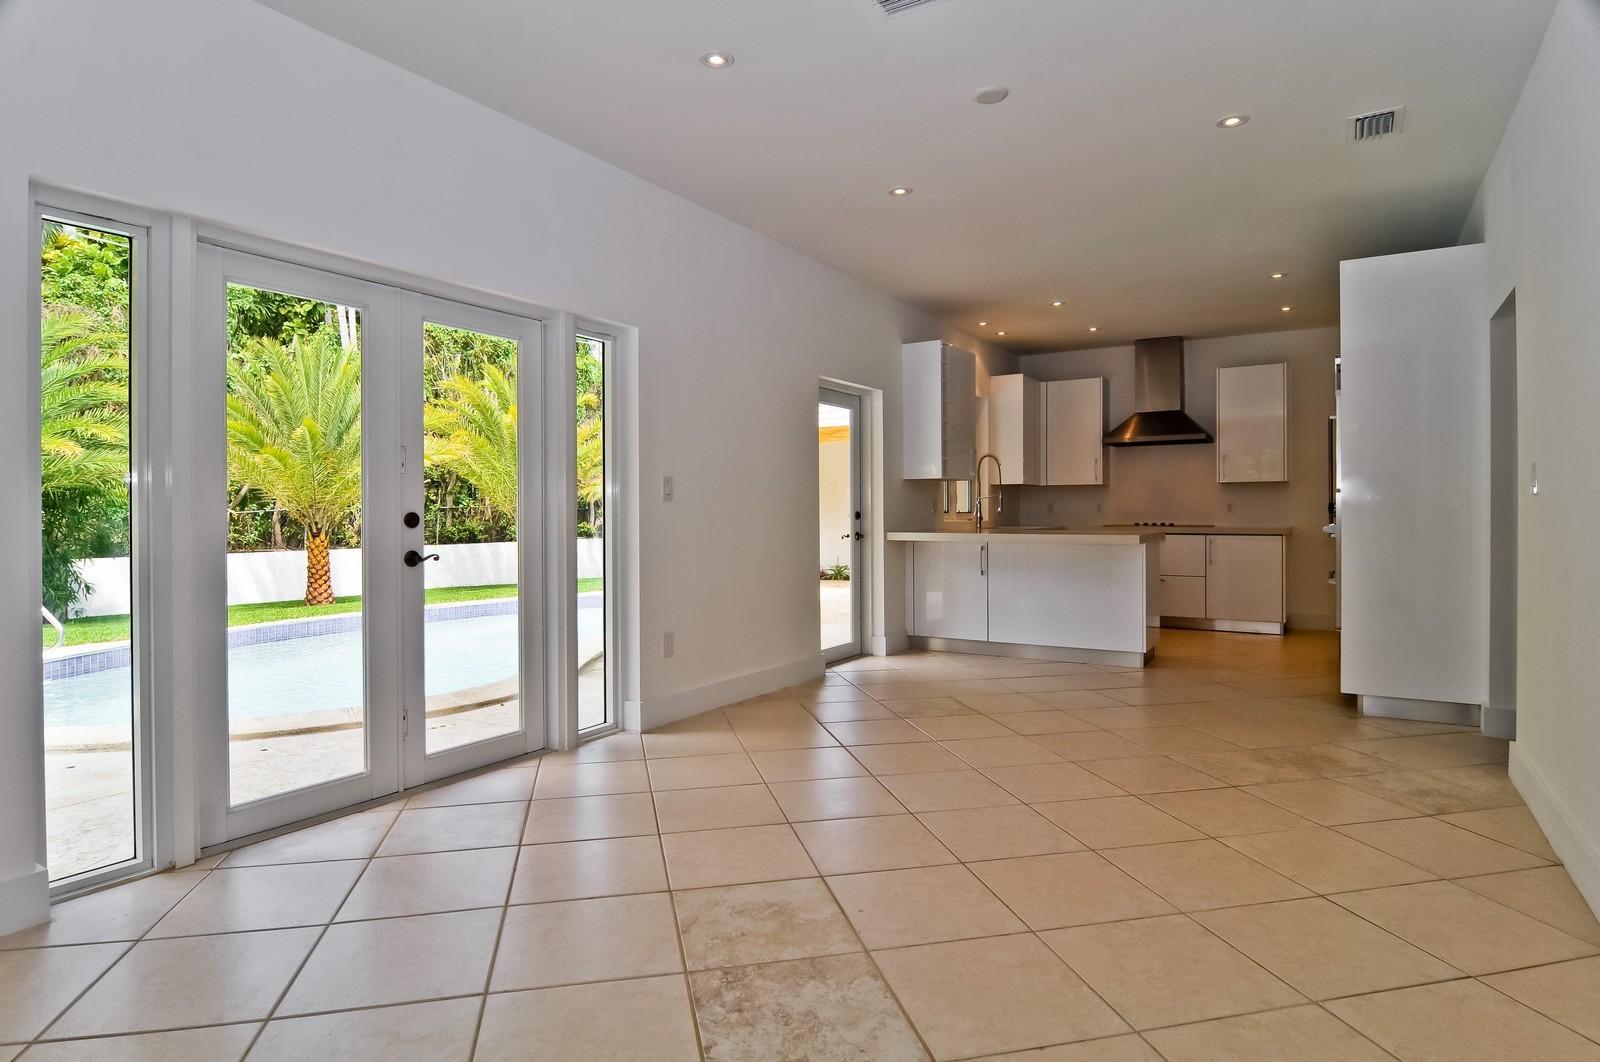 Real Estate Photography - 3645 Battersea, Miami, FL, 33133 - Family Room / Kitchen